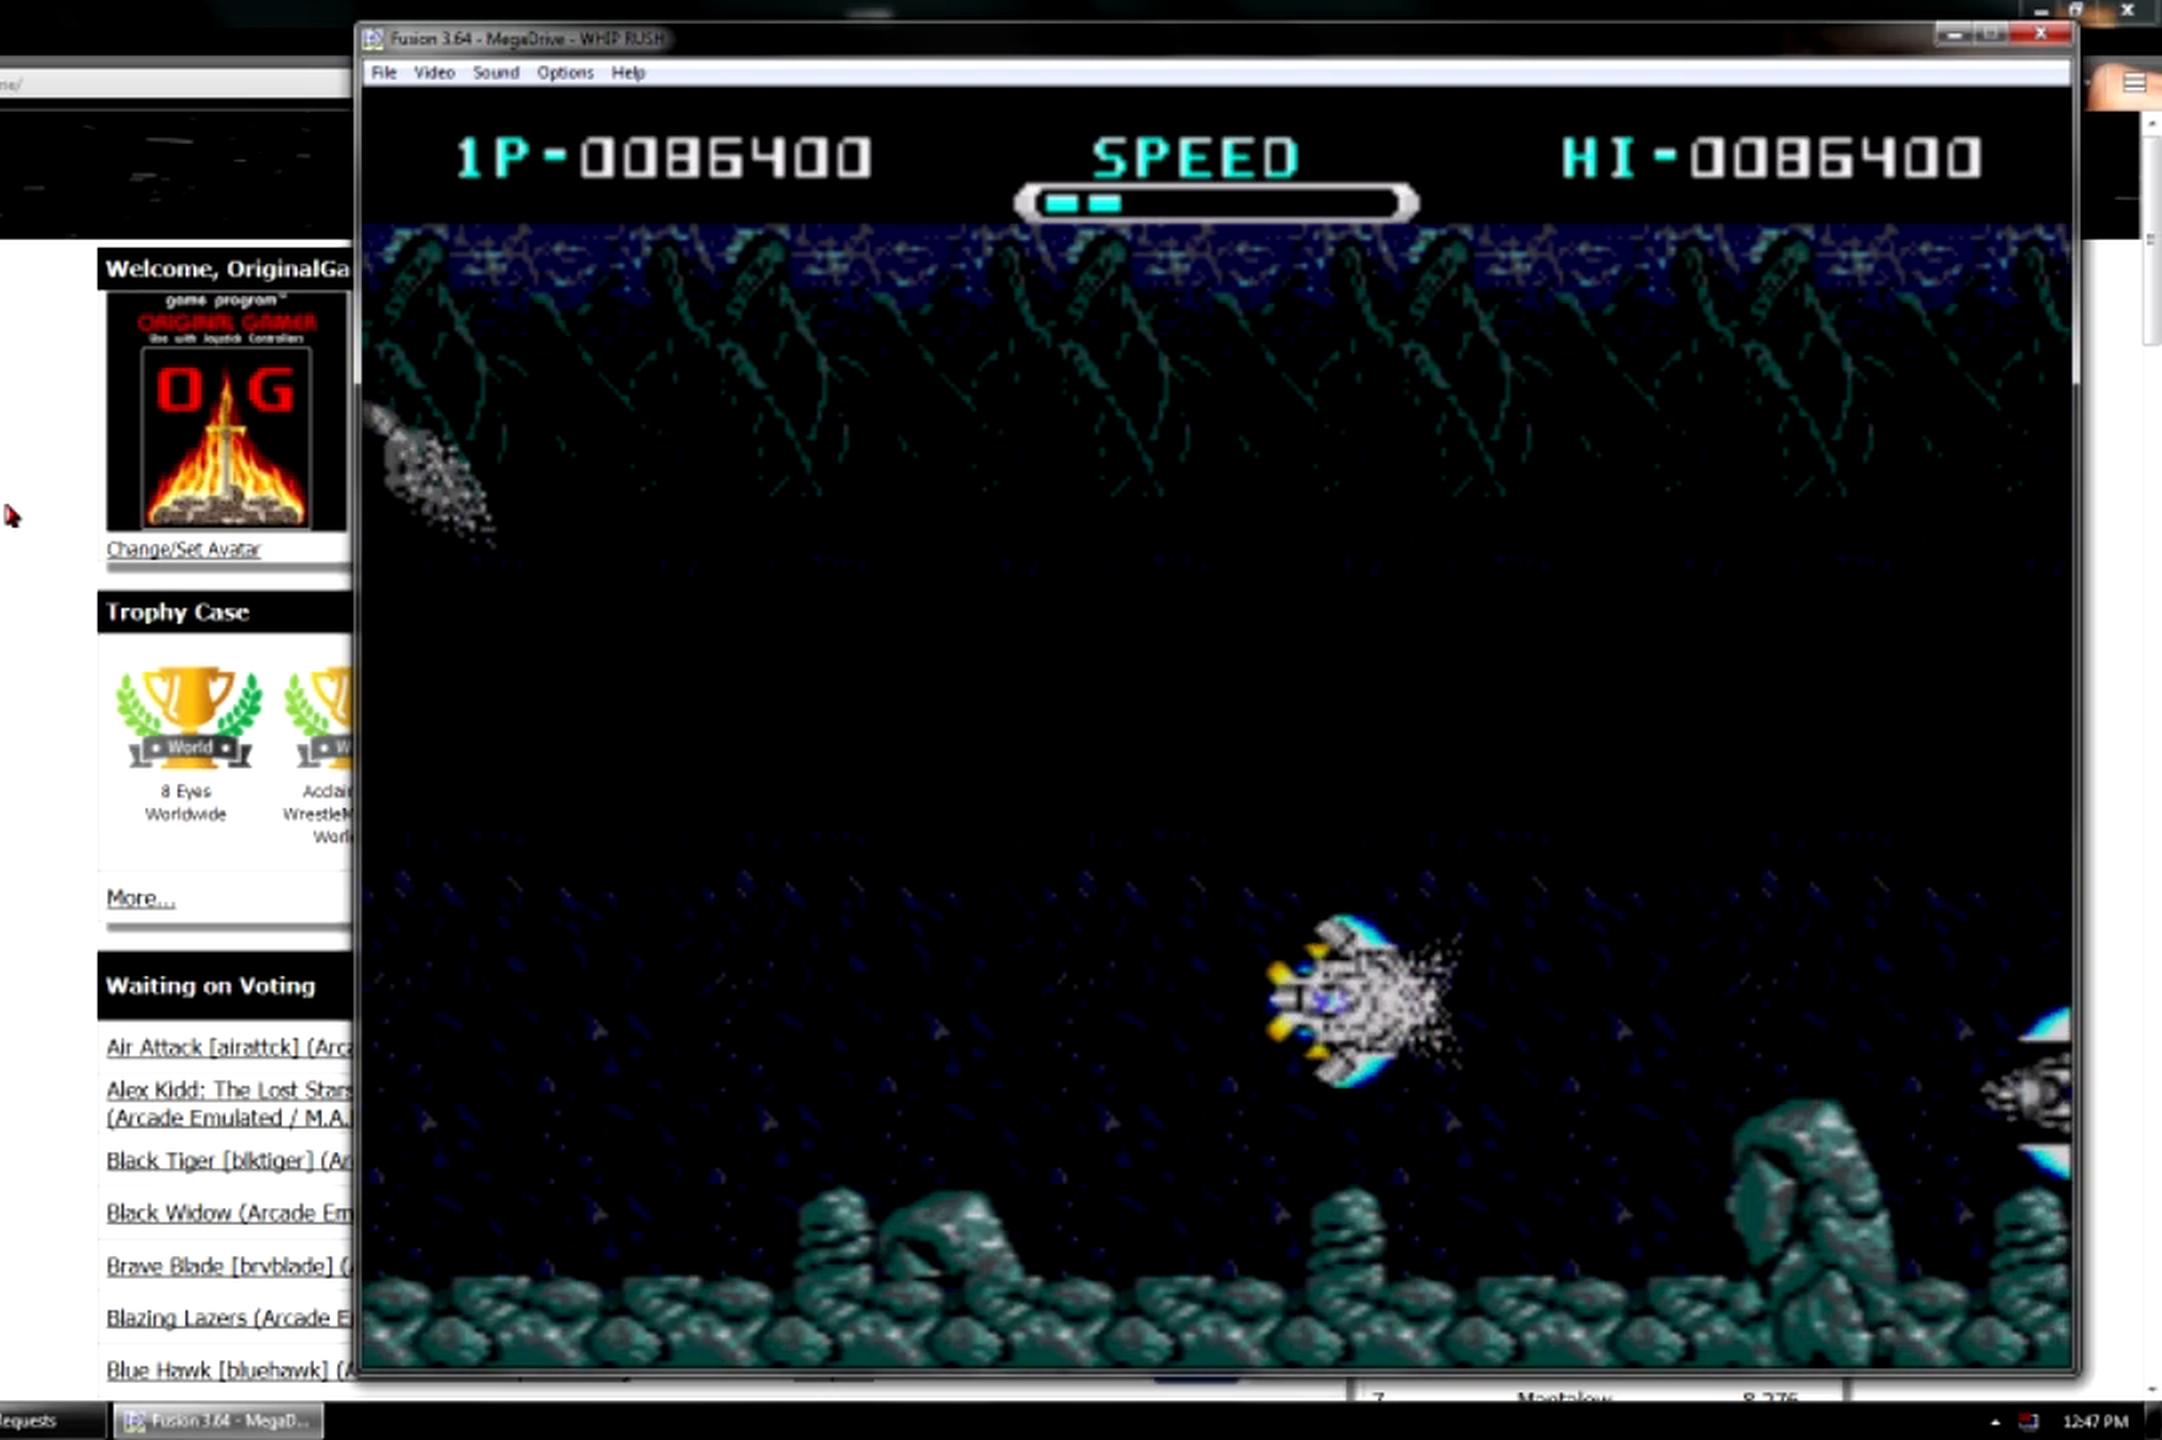 OriginalGamer: Whip Rush: Wakusei Voltegas no Nazo [Normal] (Sega Genesis / MegaDrive Emulated) 86,400 points on 2015-06-20 19:00:55